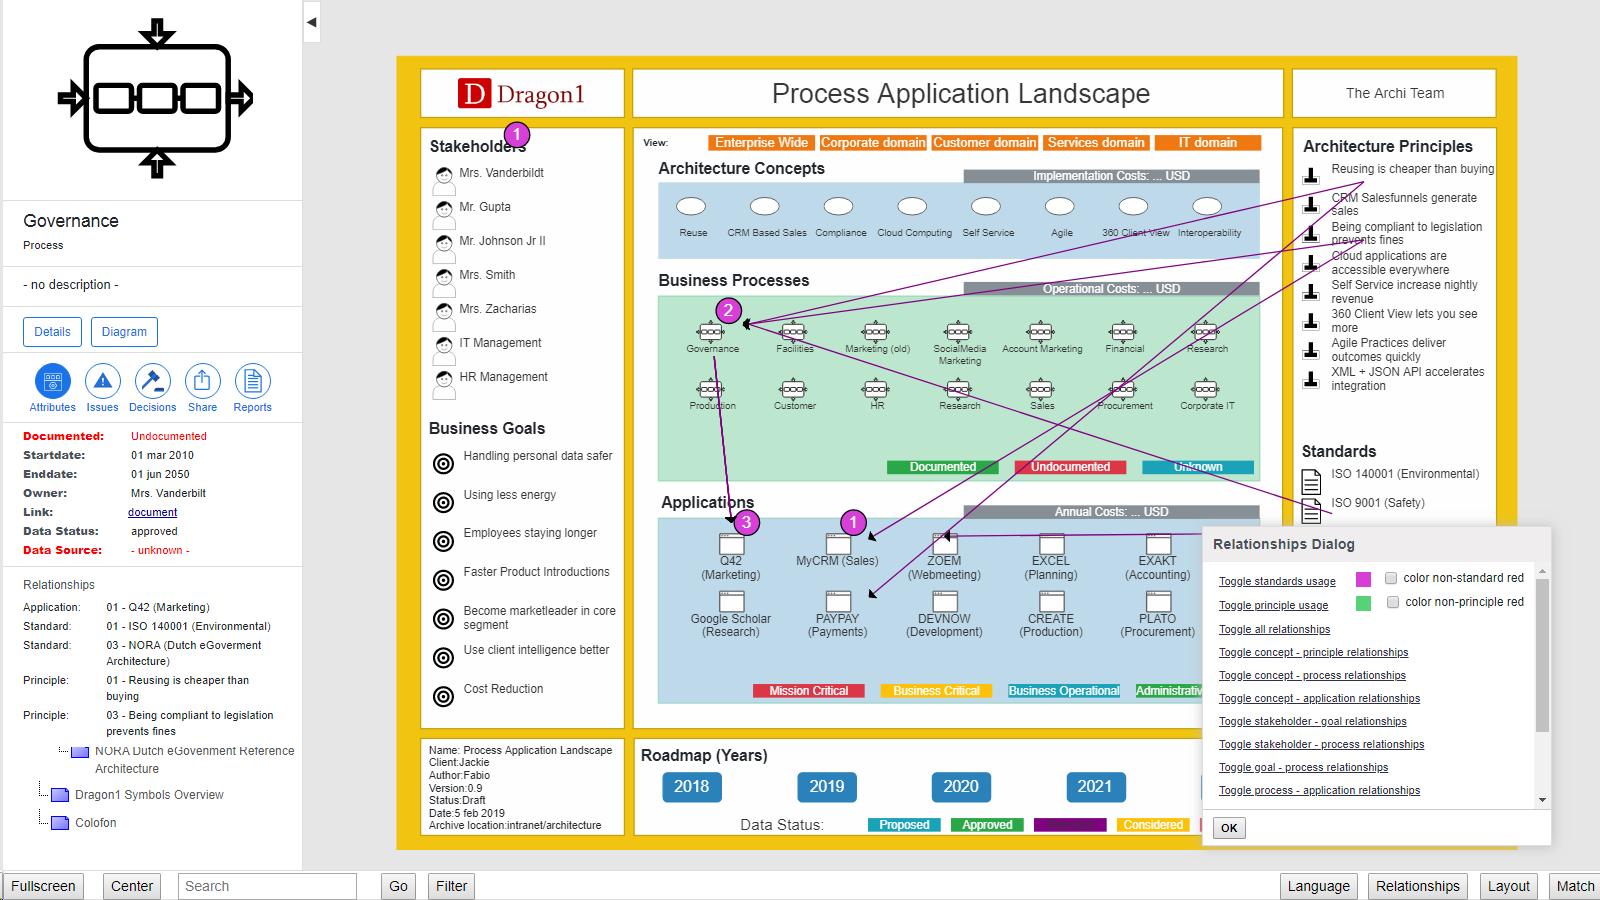 standard processes applications